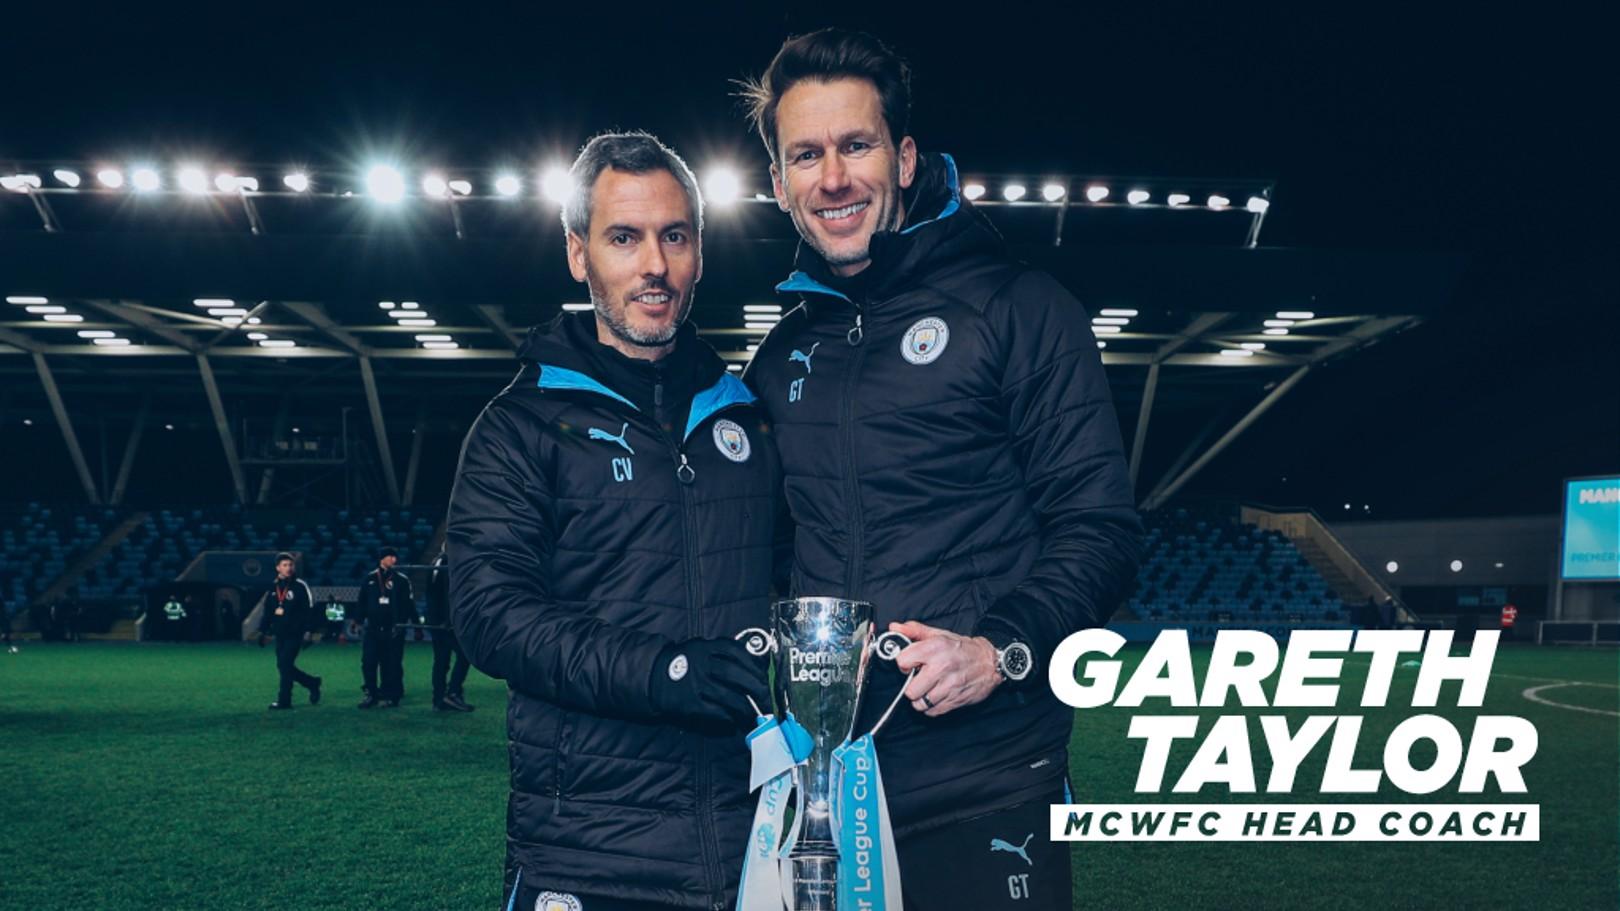 Gareth Taylor novo treinador principal do Manchester City